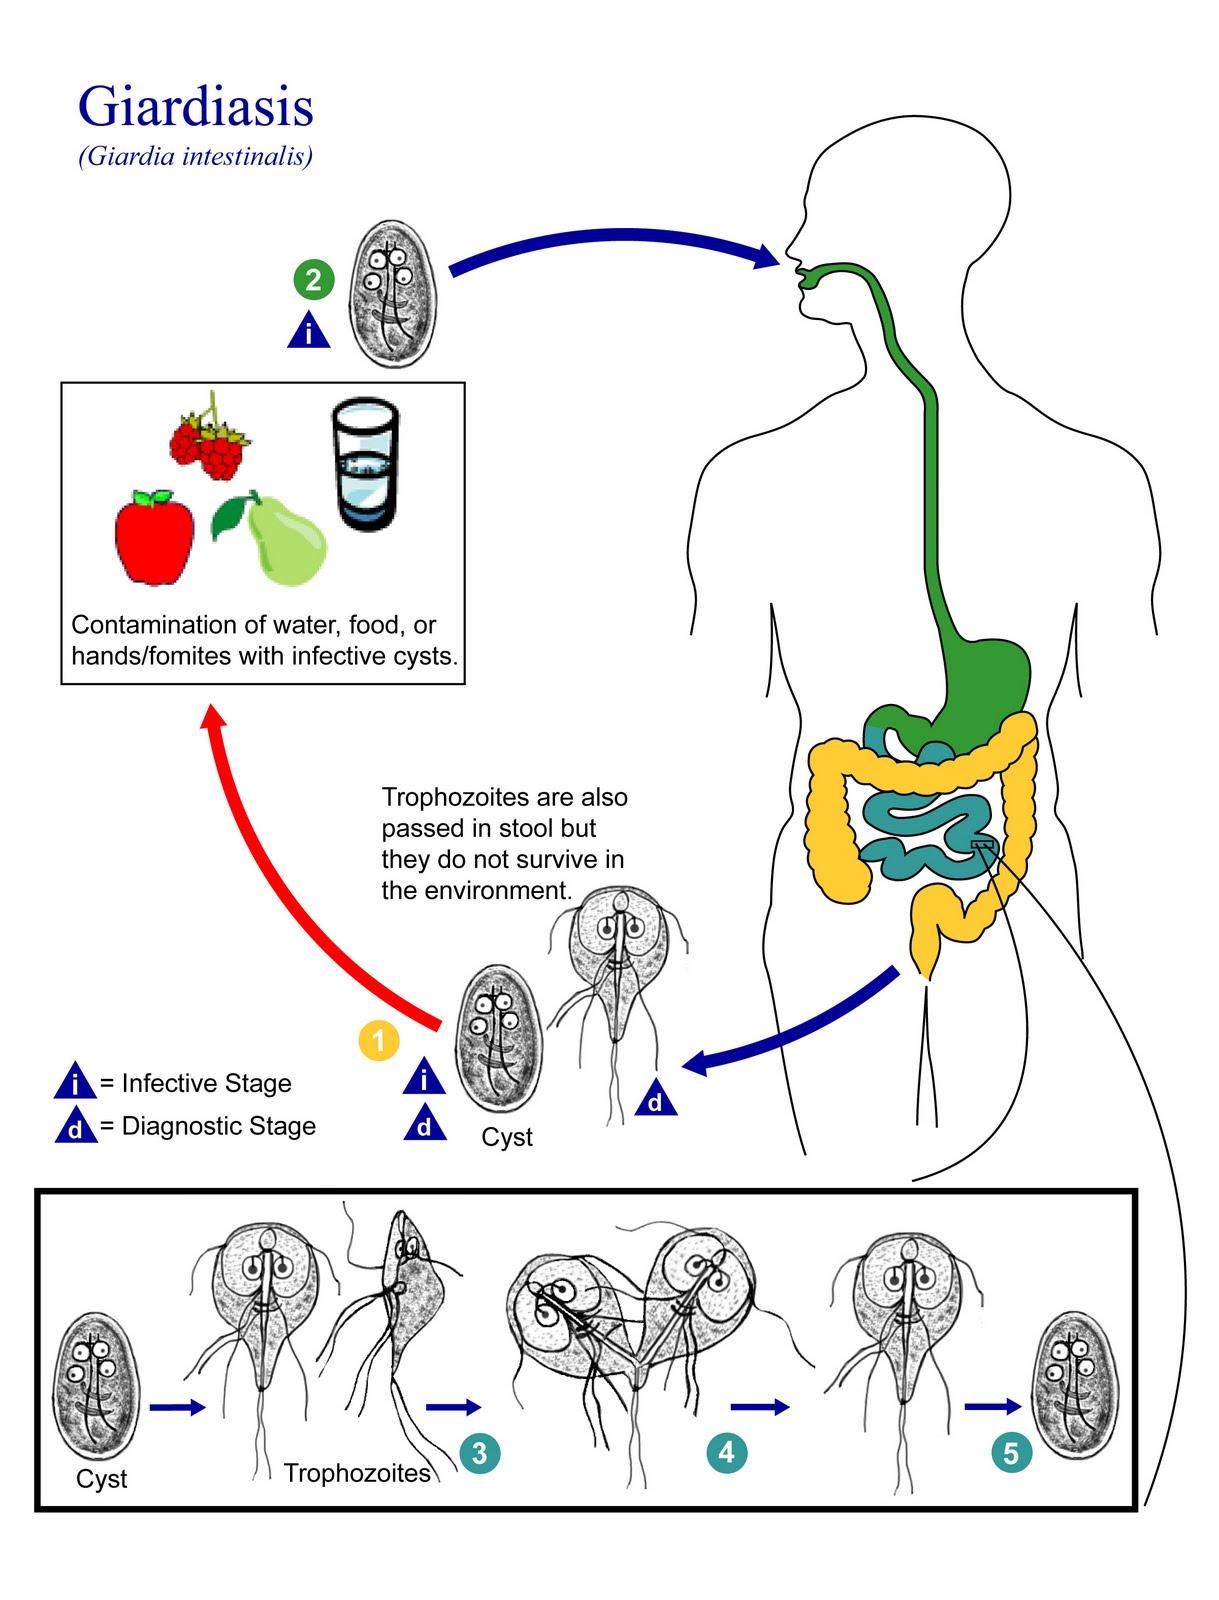 Giardiasis fájdalom a jobb hypochondriumban. Fájdalom az epehólyagban - Giardia